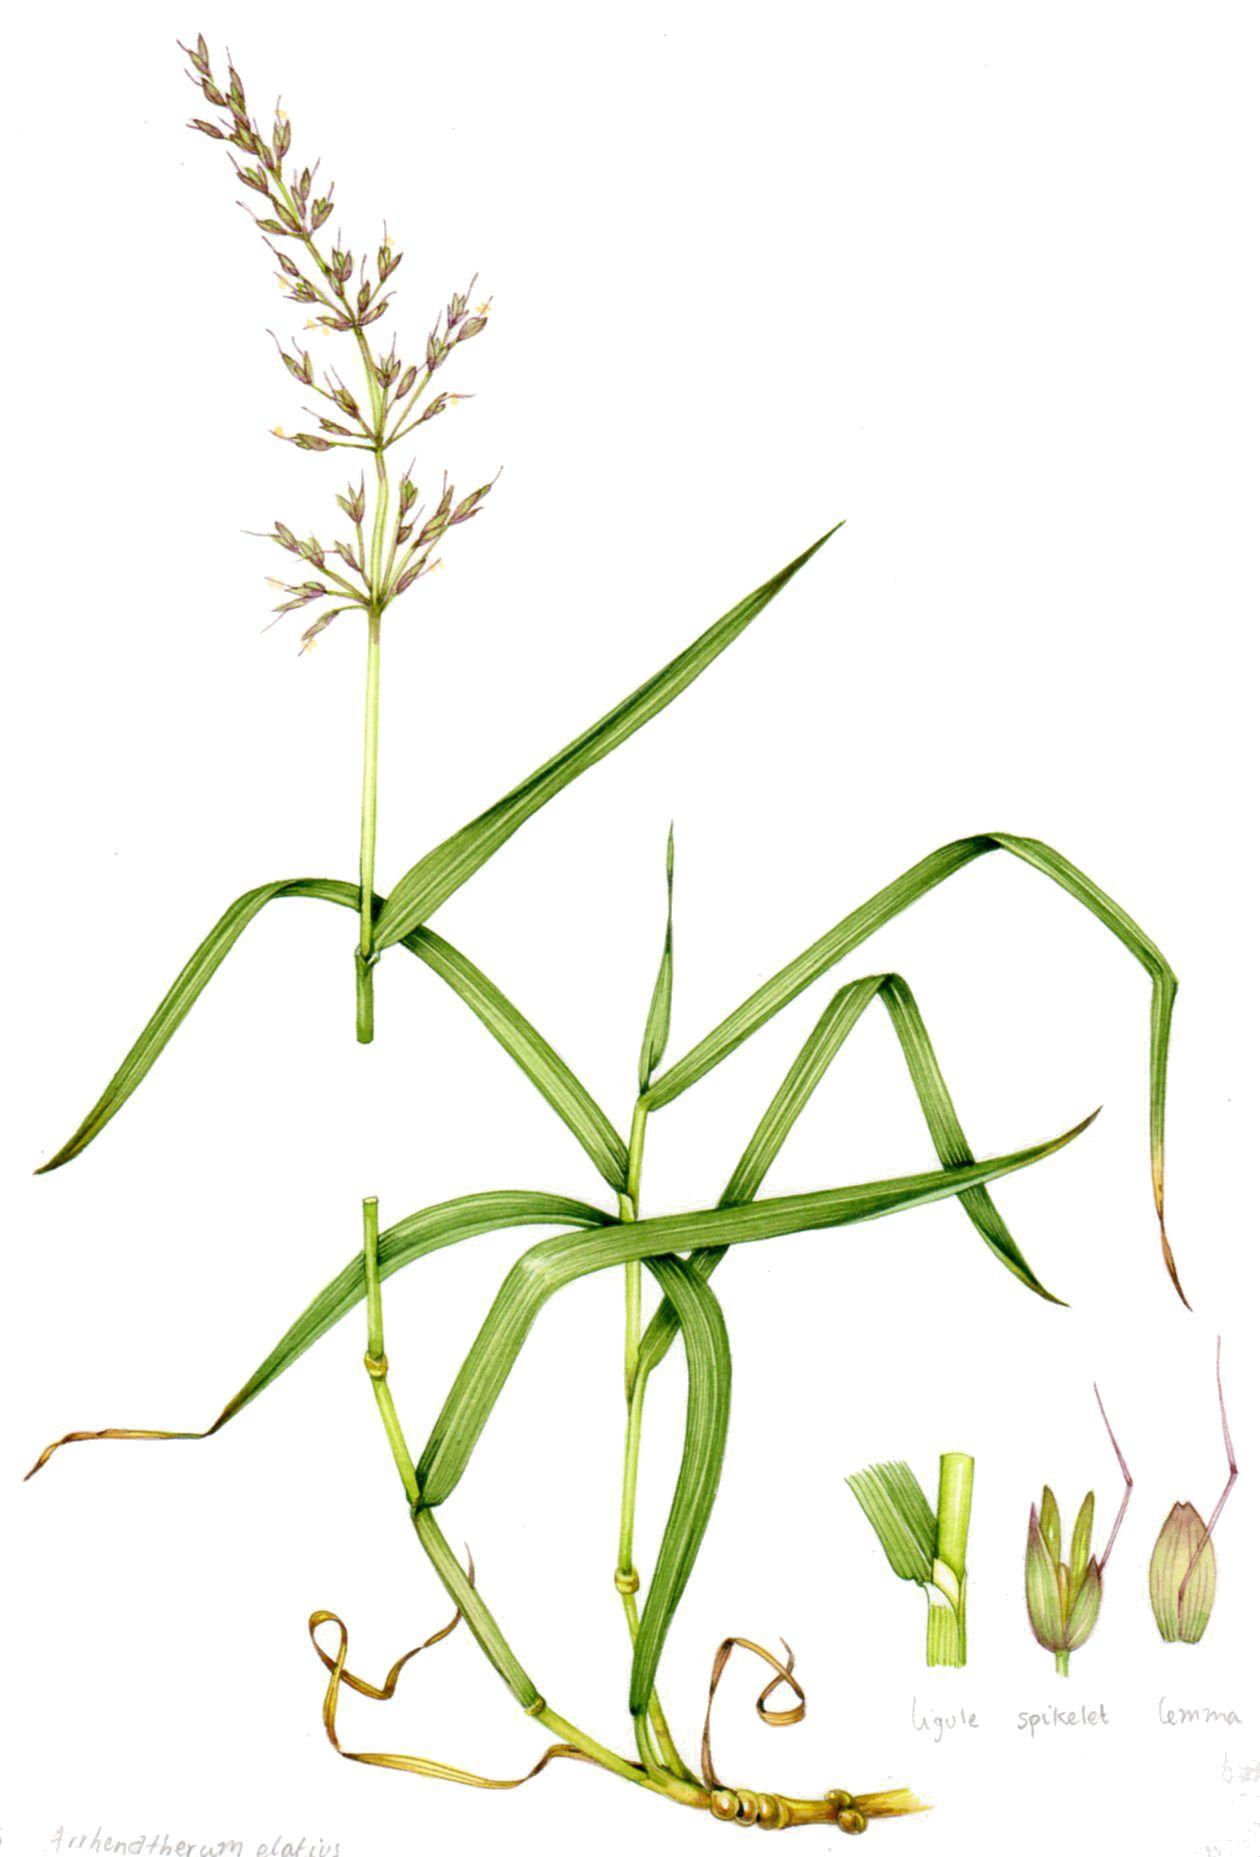 Clipart cheatgrass picture black and white stock False oat grass Arrhenatherum elatius copyright www.lizzieharper.co ... picture black and white stock